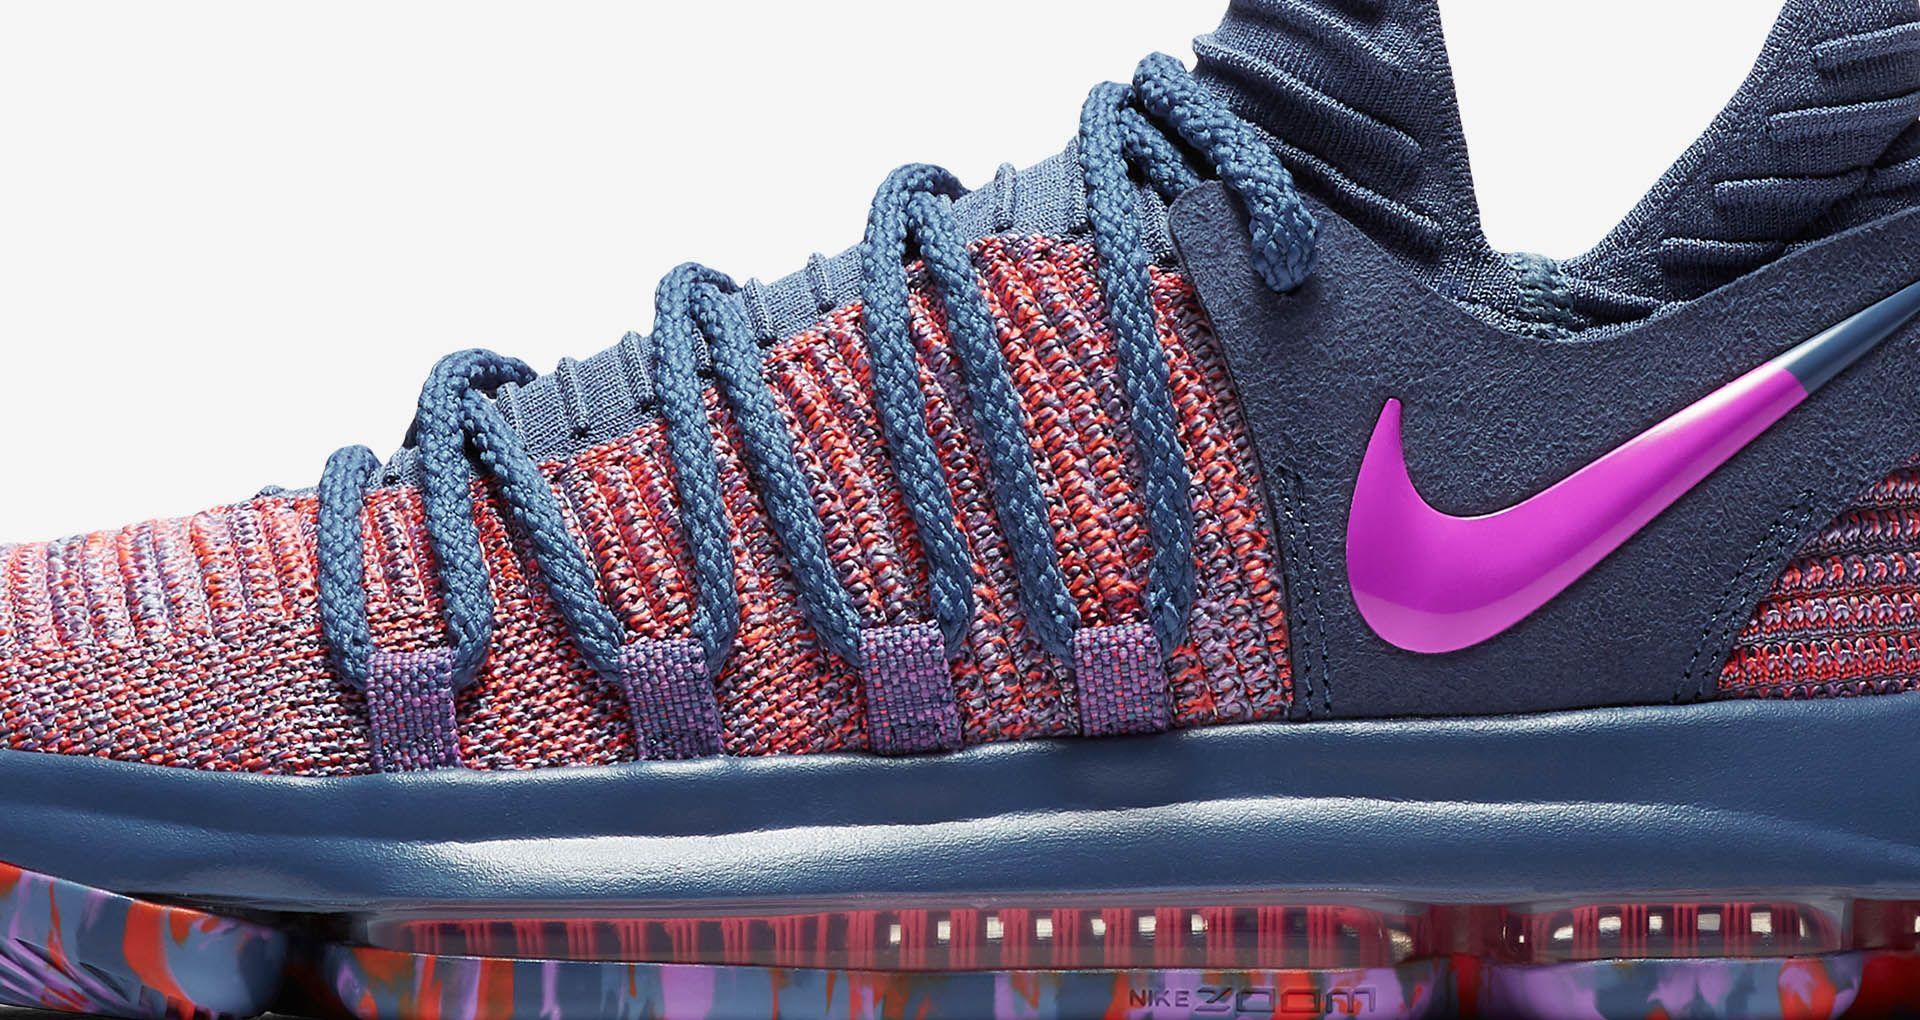 cc83a0527e17 Nike KDX All Star 2018  Ocean Fog and Fuchsia Blast  Release Date ...